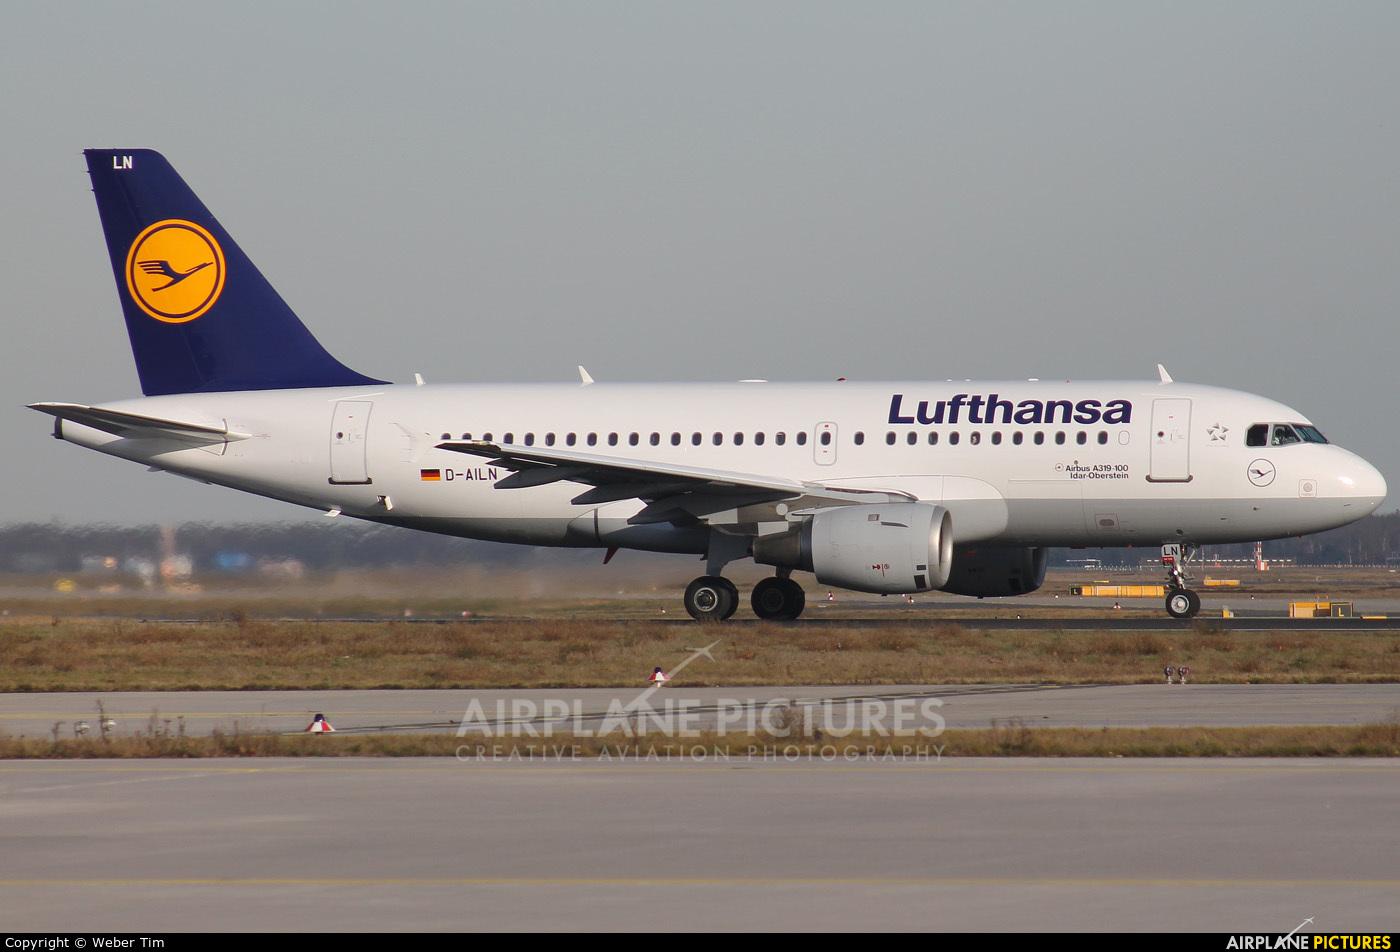 Lufthansa D-AILN aircraft at Frankfurt